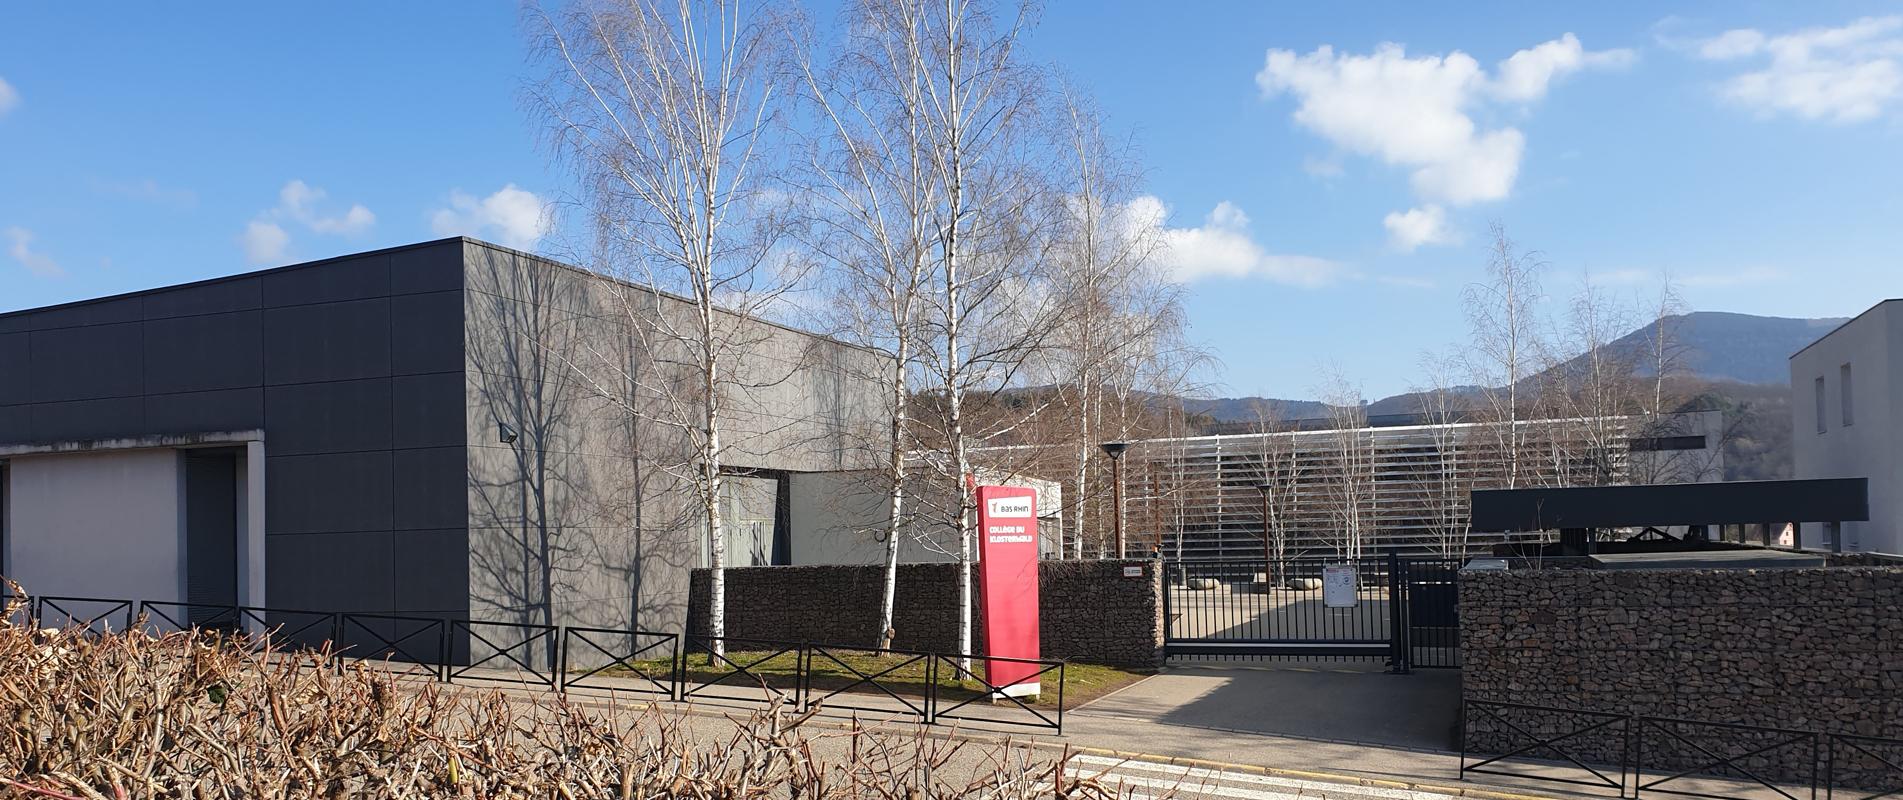 Collège du Klosterwald à Villé (67)